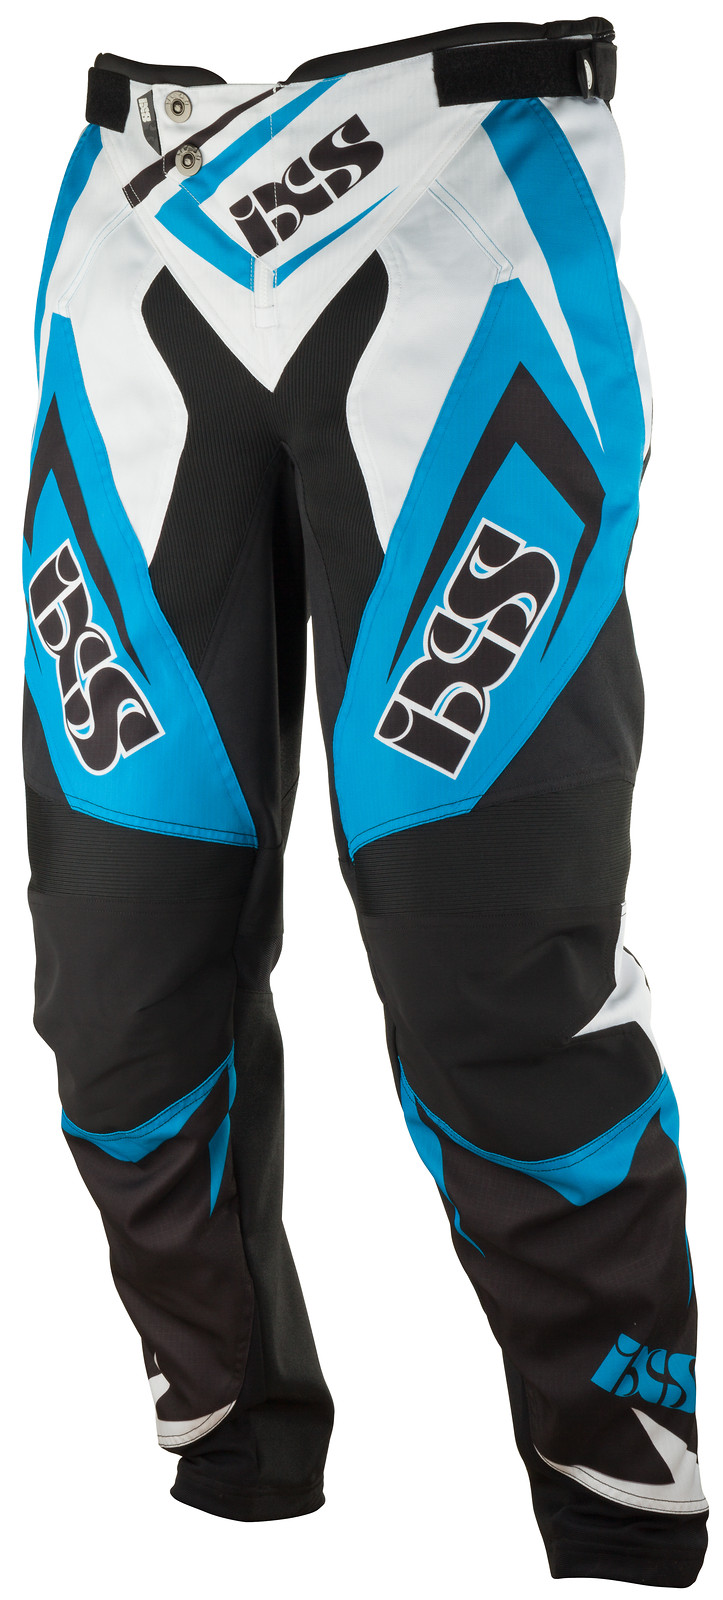 iXS Senda Pants senda blue front